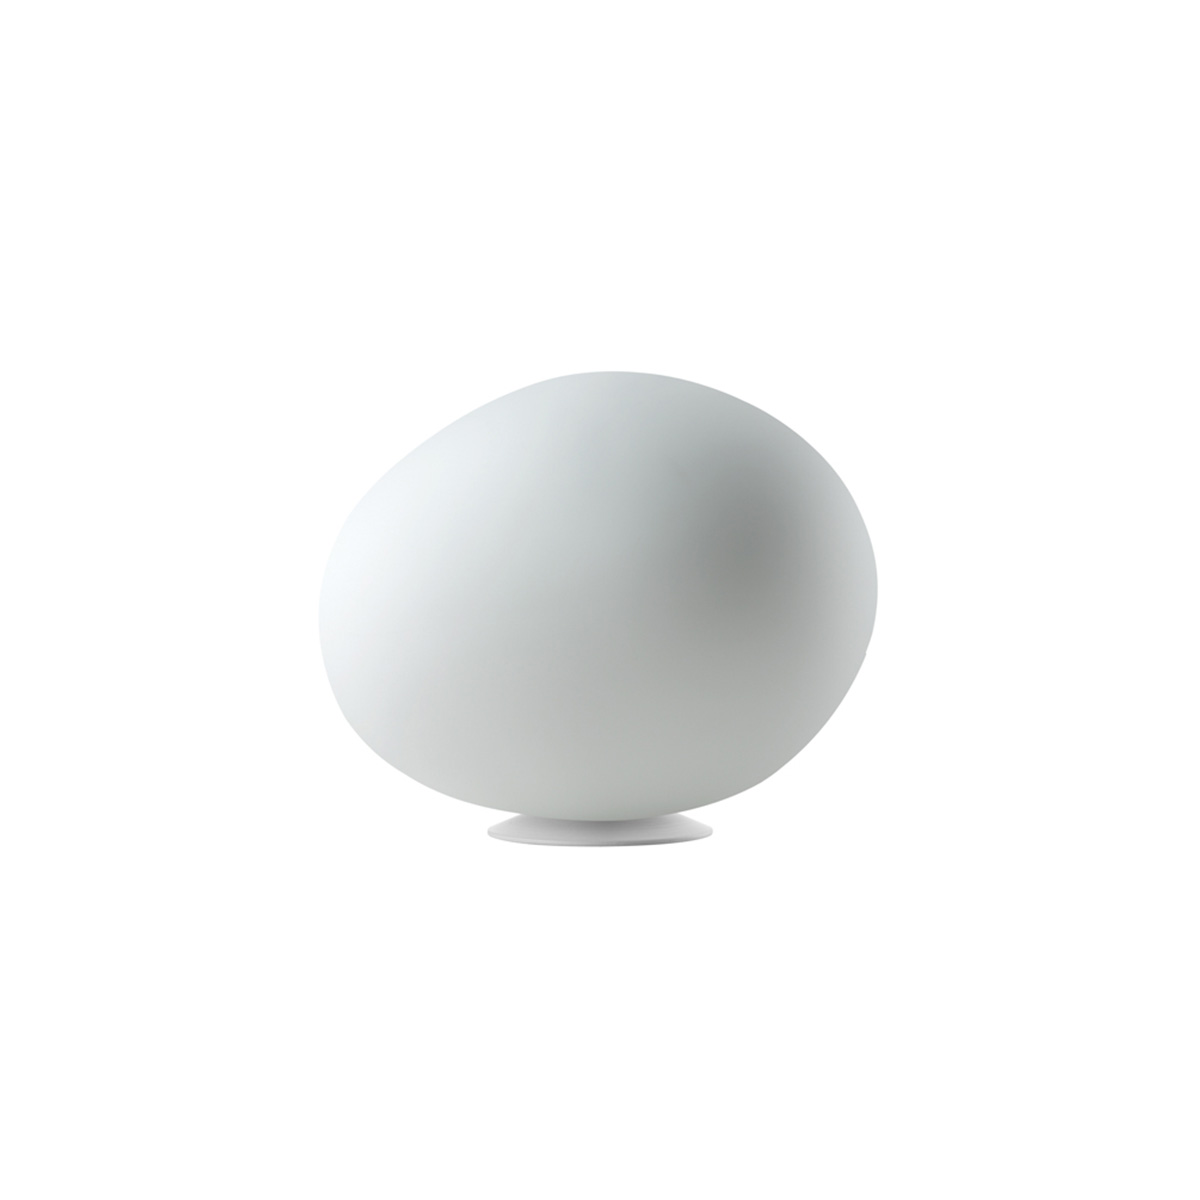 Stona lampa GREGG 1680011 10